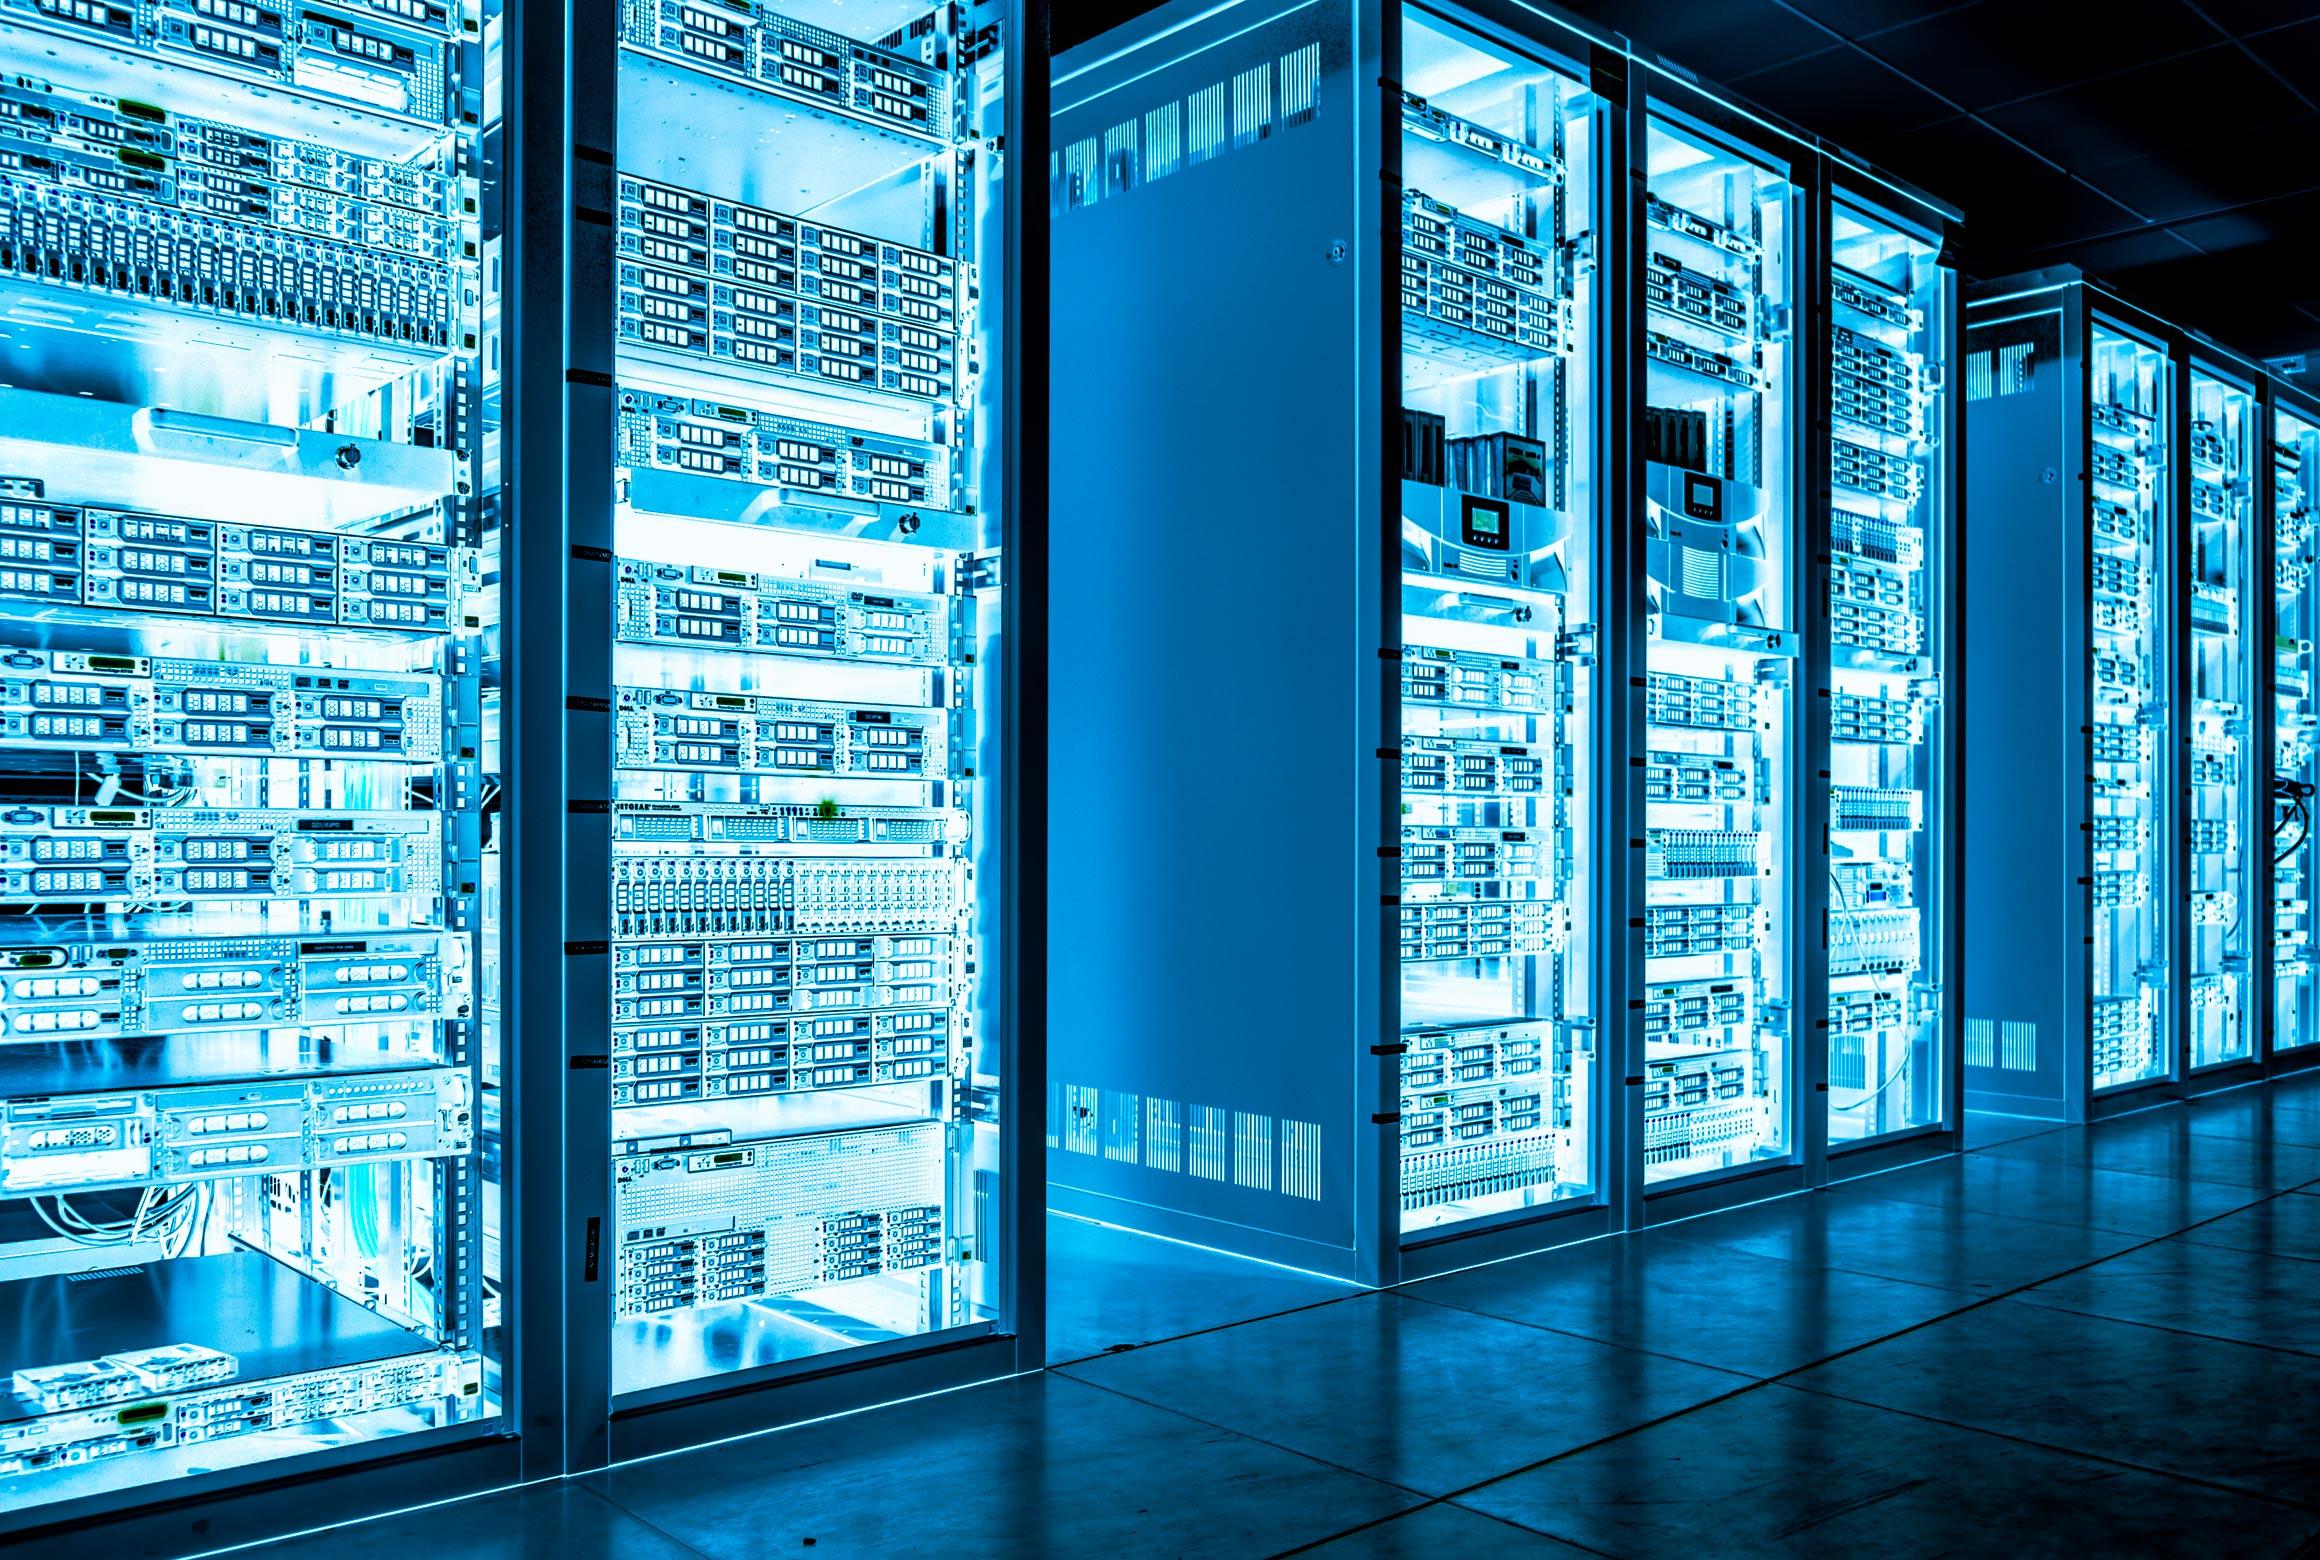 Data cabinets housing hardware